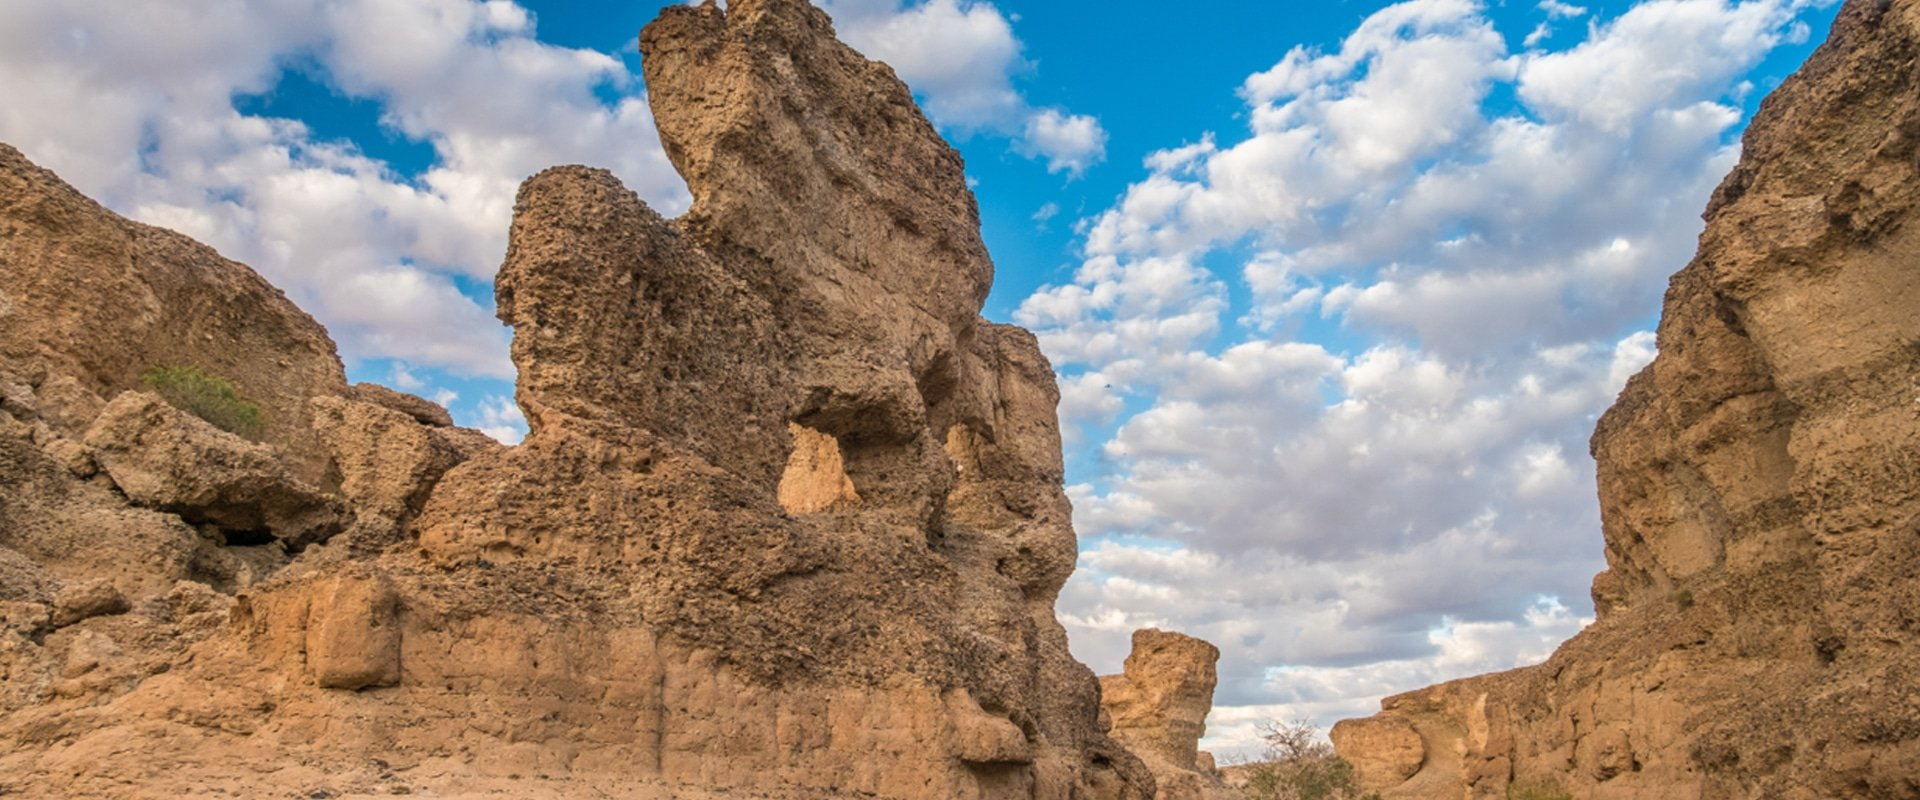 Explore the Sesriem Canyon